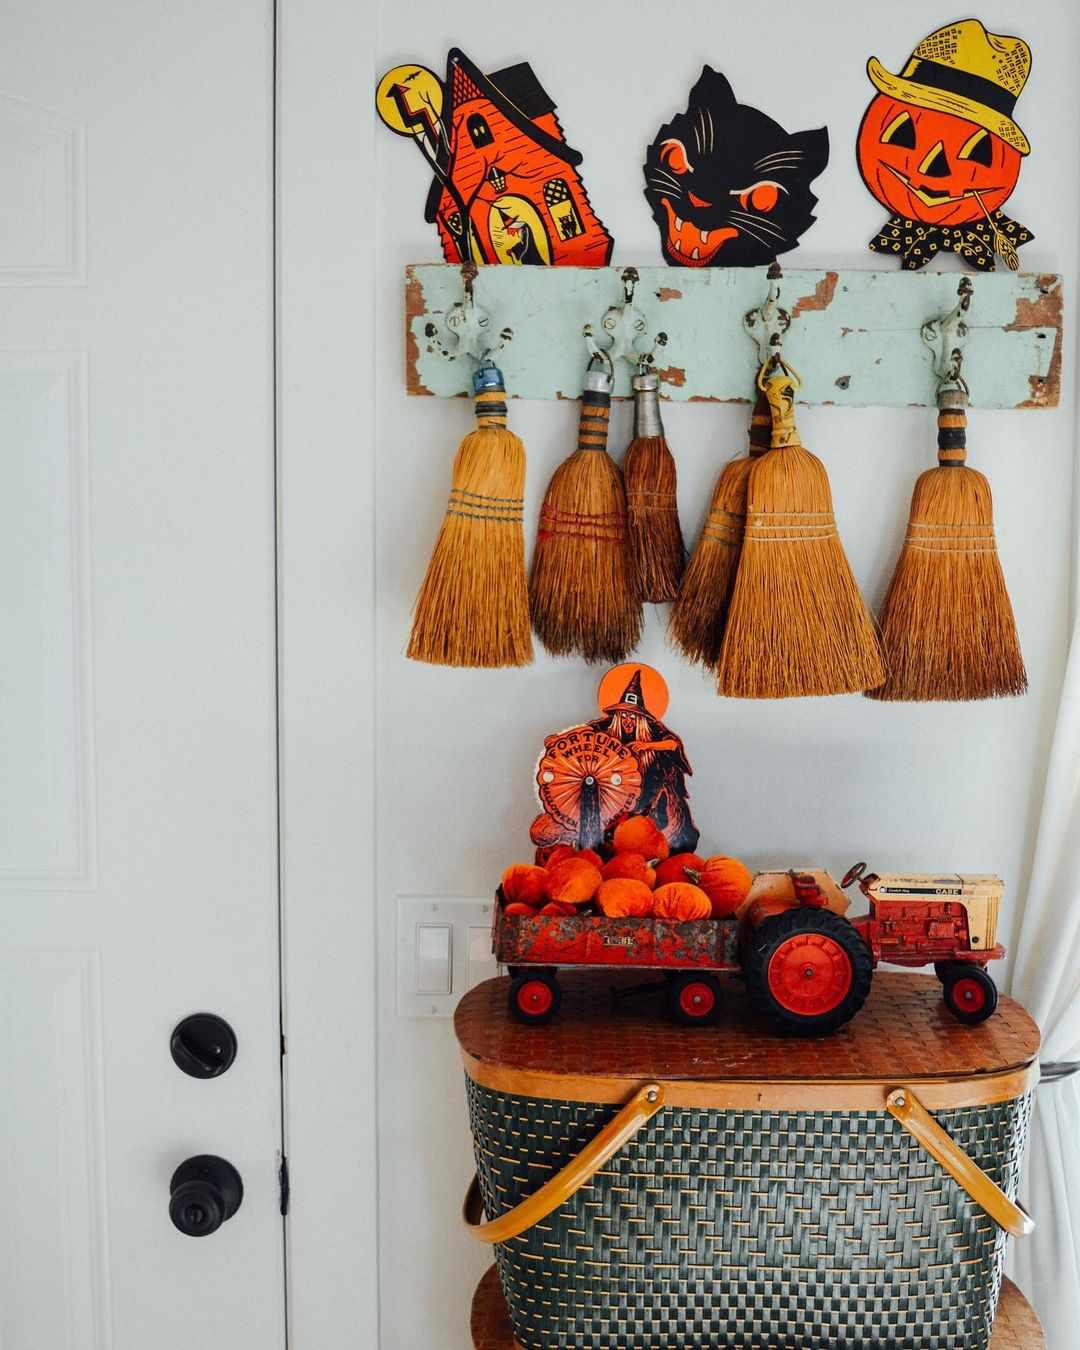 Brooms hanging up